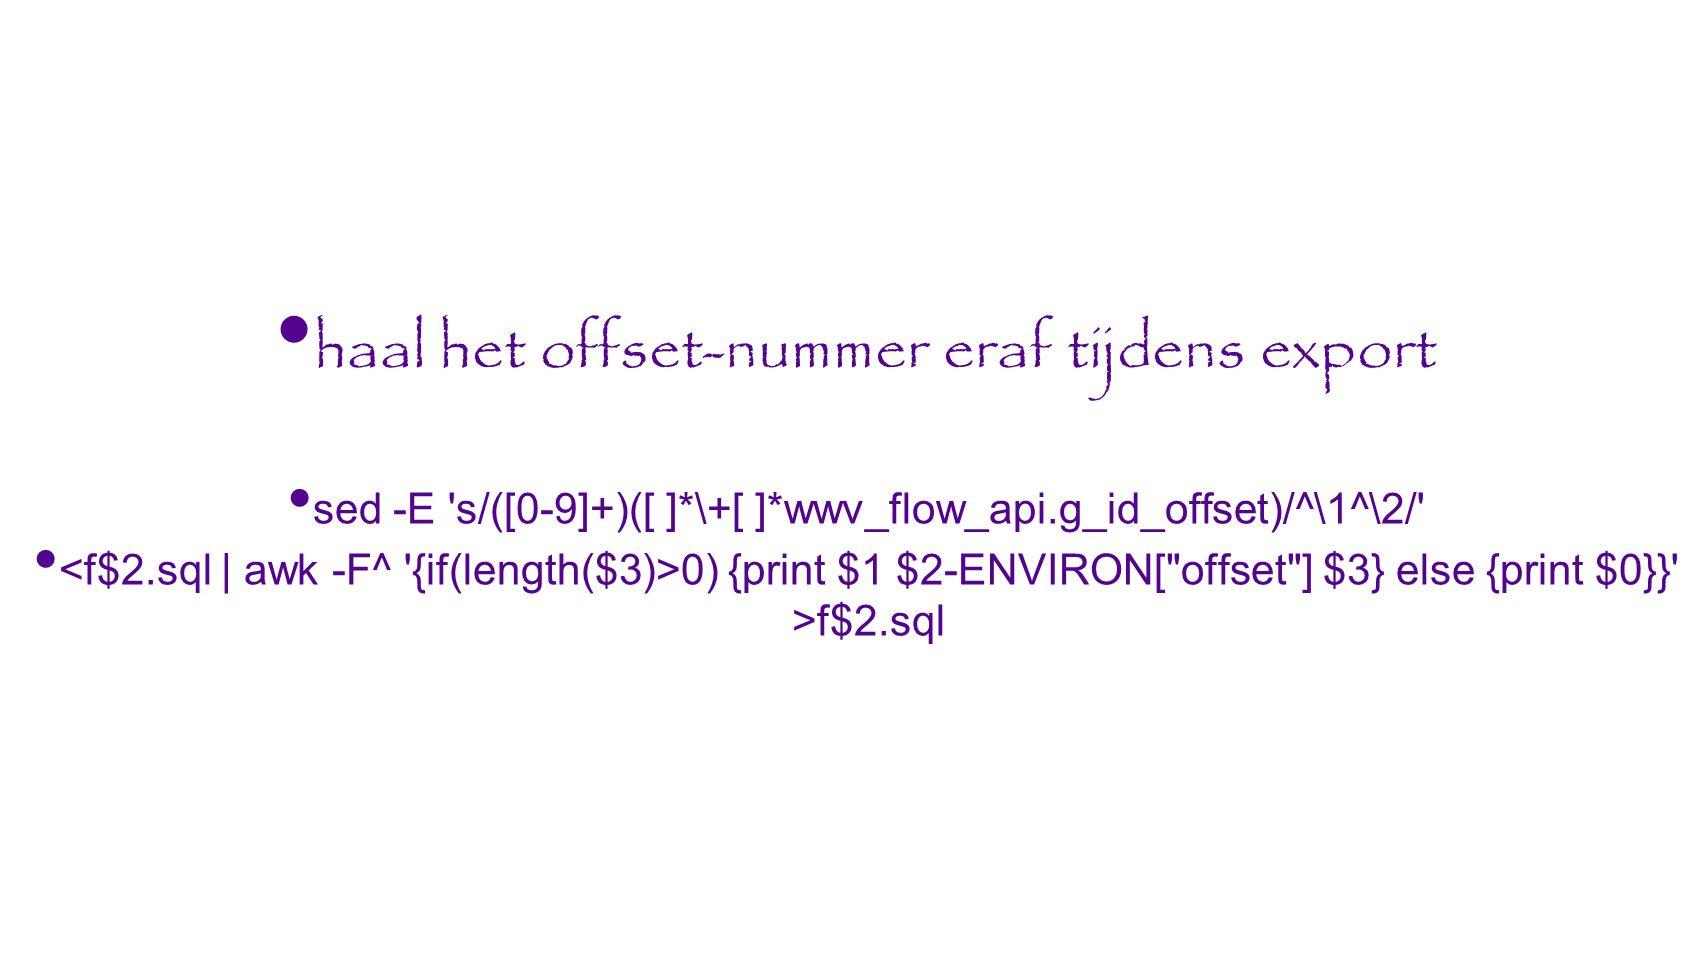 haal het offset-nummer eraf tijdens export sed -E s/([0-9]+)([ ]*\+[ ]*wwv_flow_api.g_id_offset)/^\1^\2/ 0) {print $1 $2-ENVIRON[ offset ] $3} else {print $0}} >f$2.sql